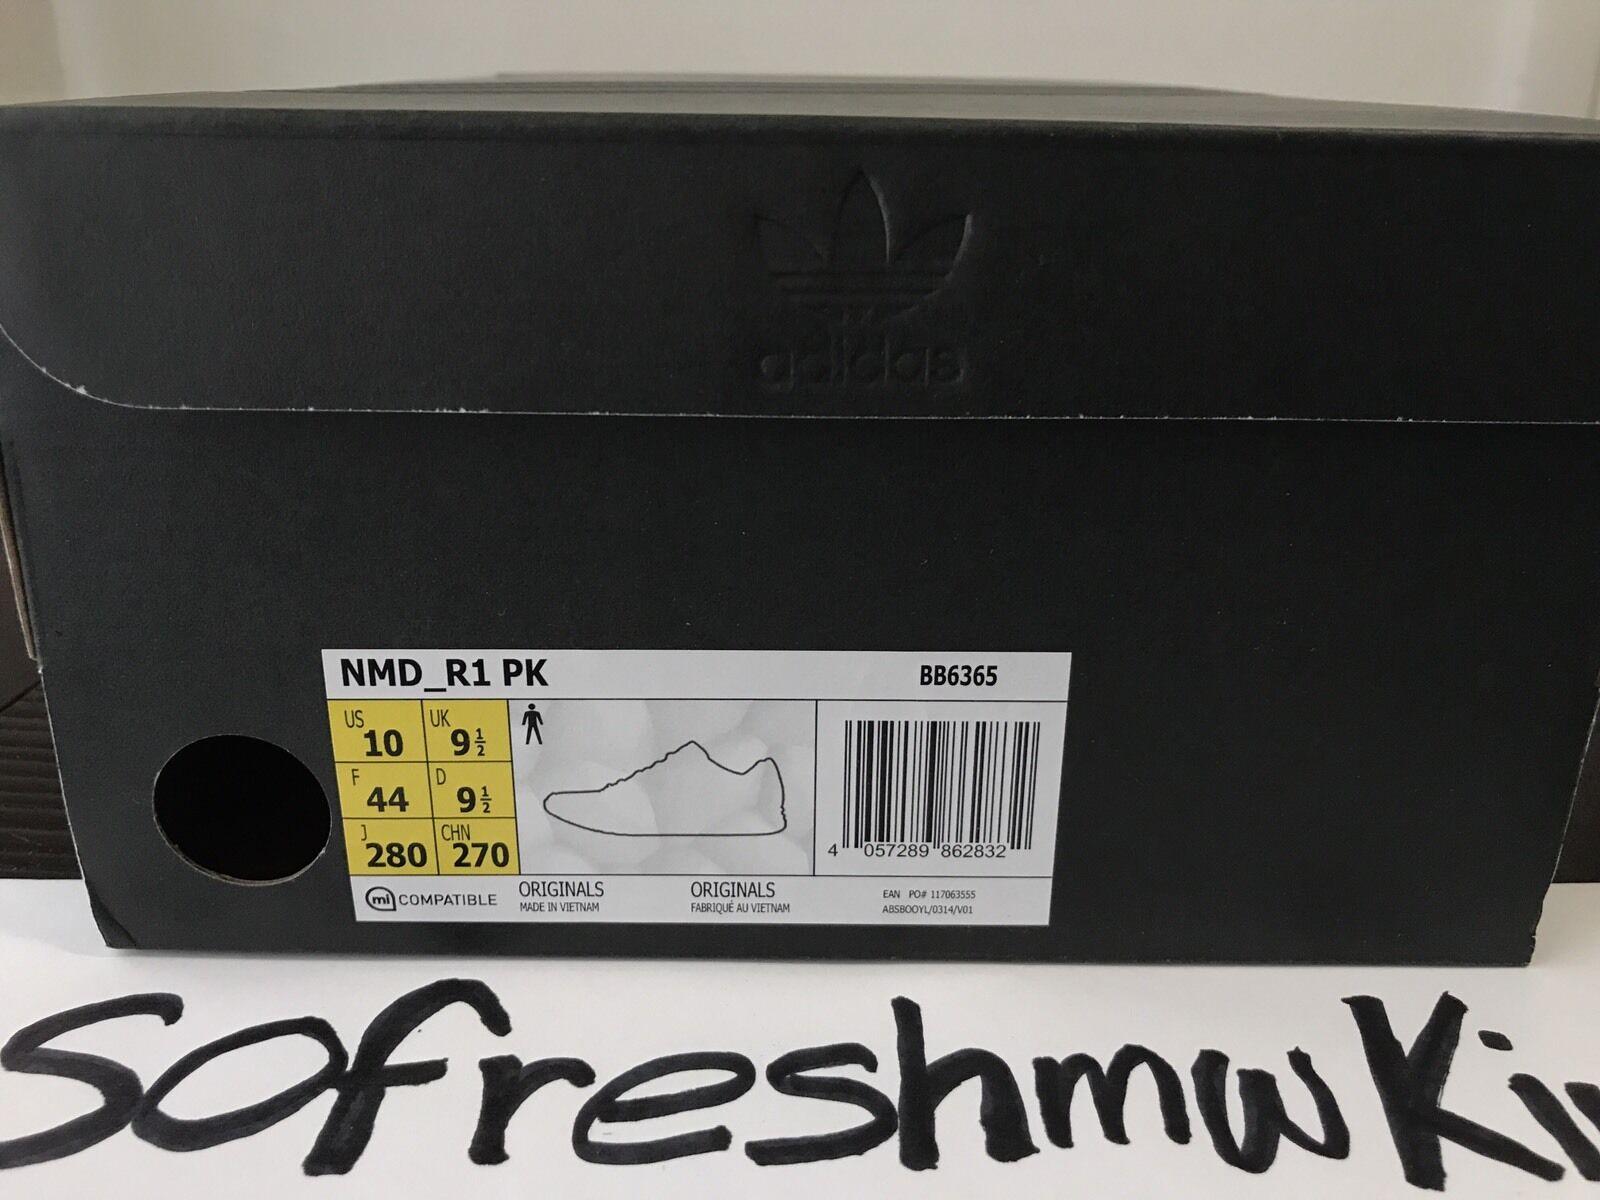 Adidas NMD R1 PK SNS Datamosh BB6365 BB6365 BB6365 Size 10 US Vapour Steel Glitch orange 3e38bc